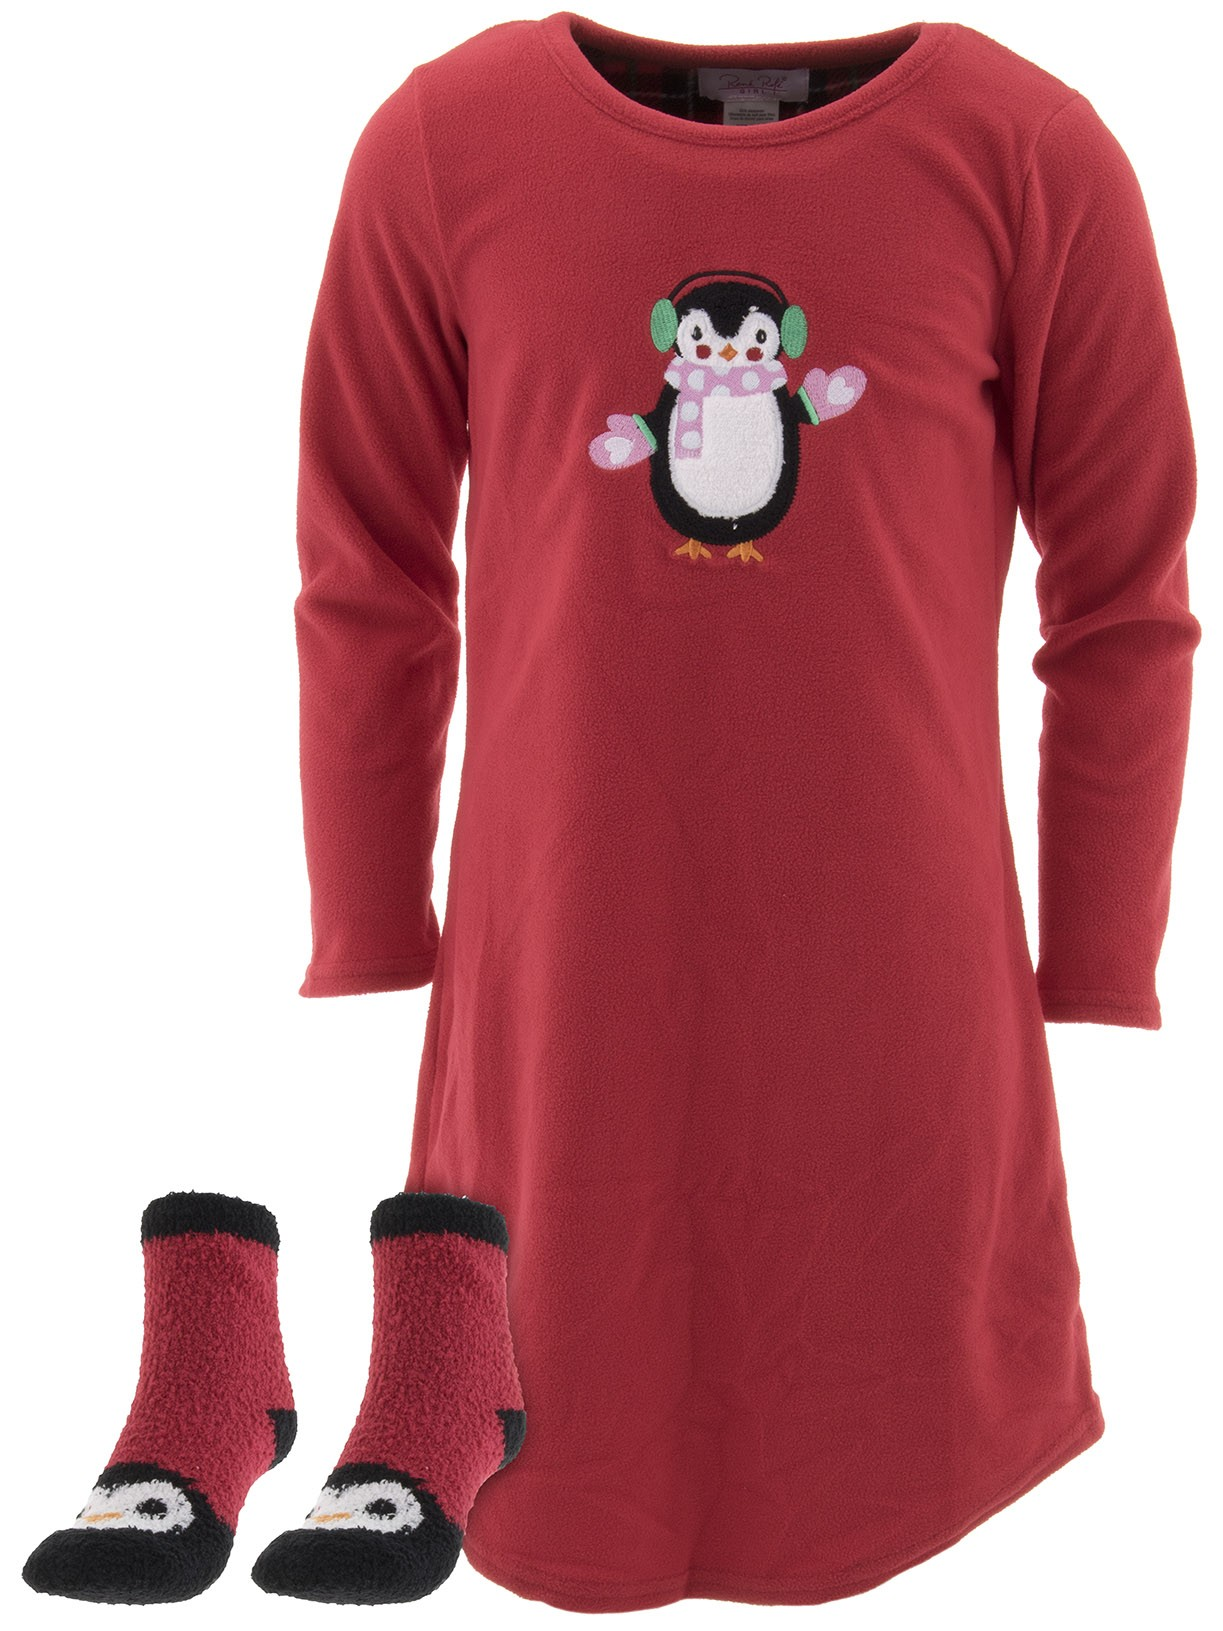 Rene Rofe Girls Penguin Red Nightgown and Socks Set